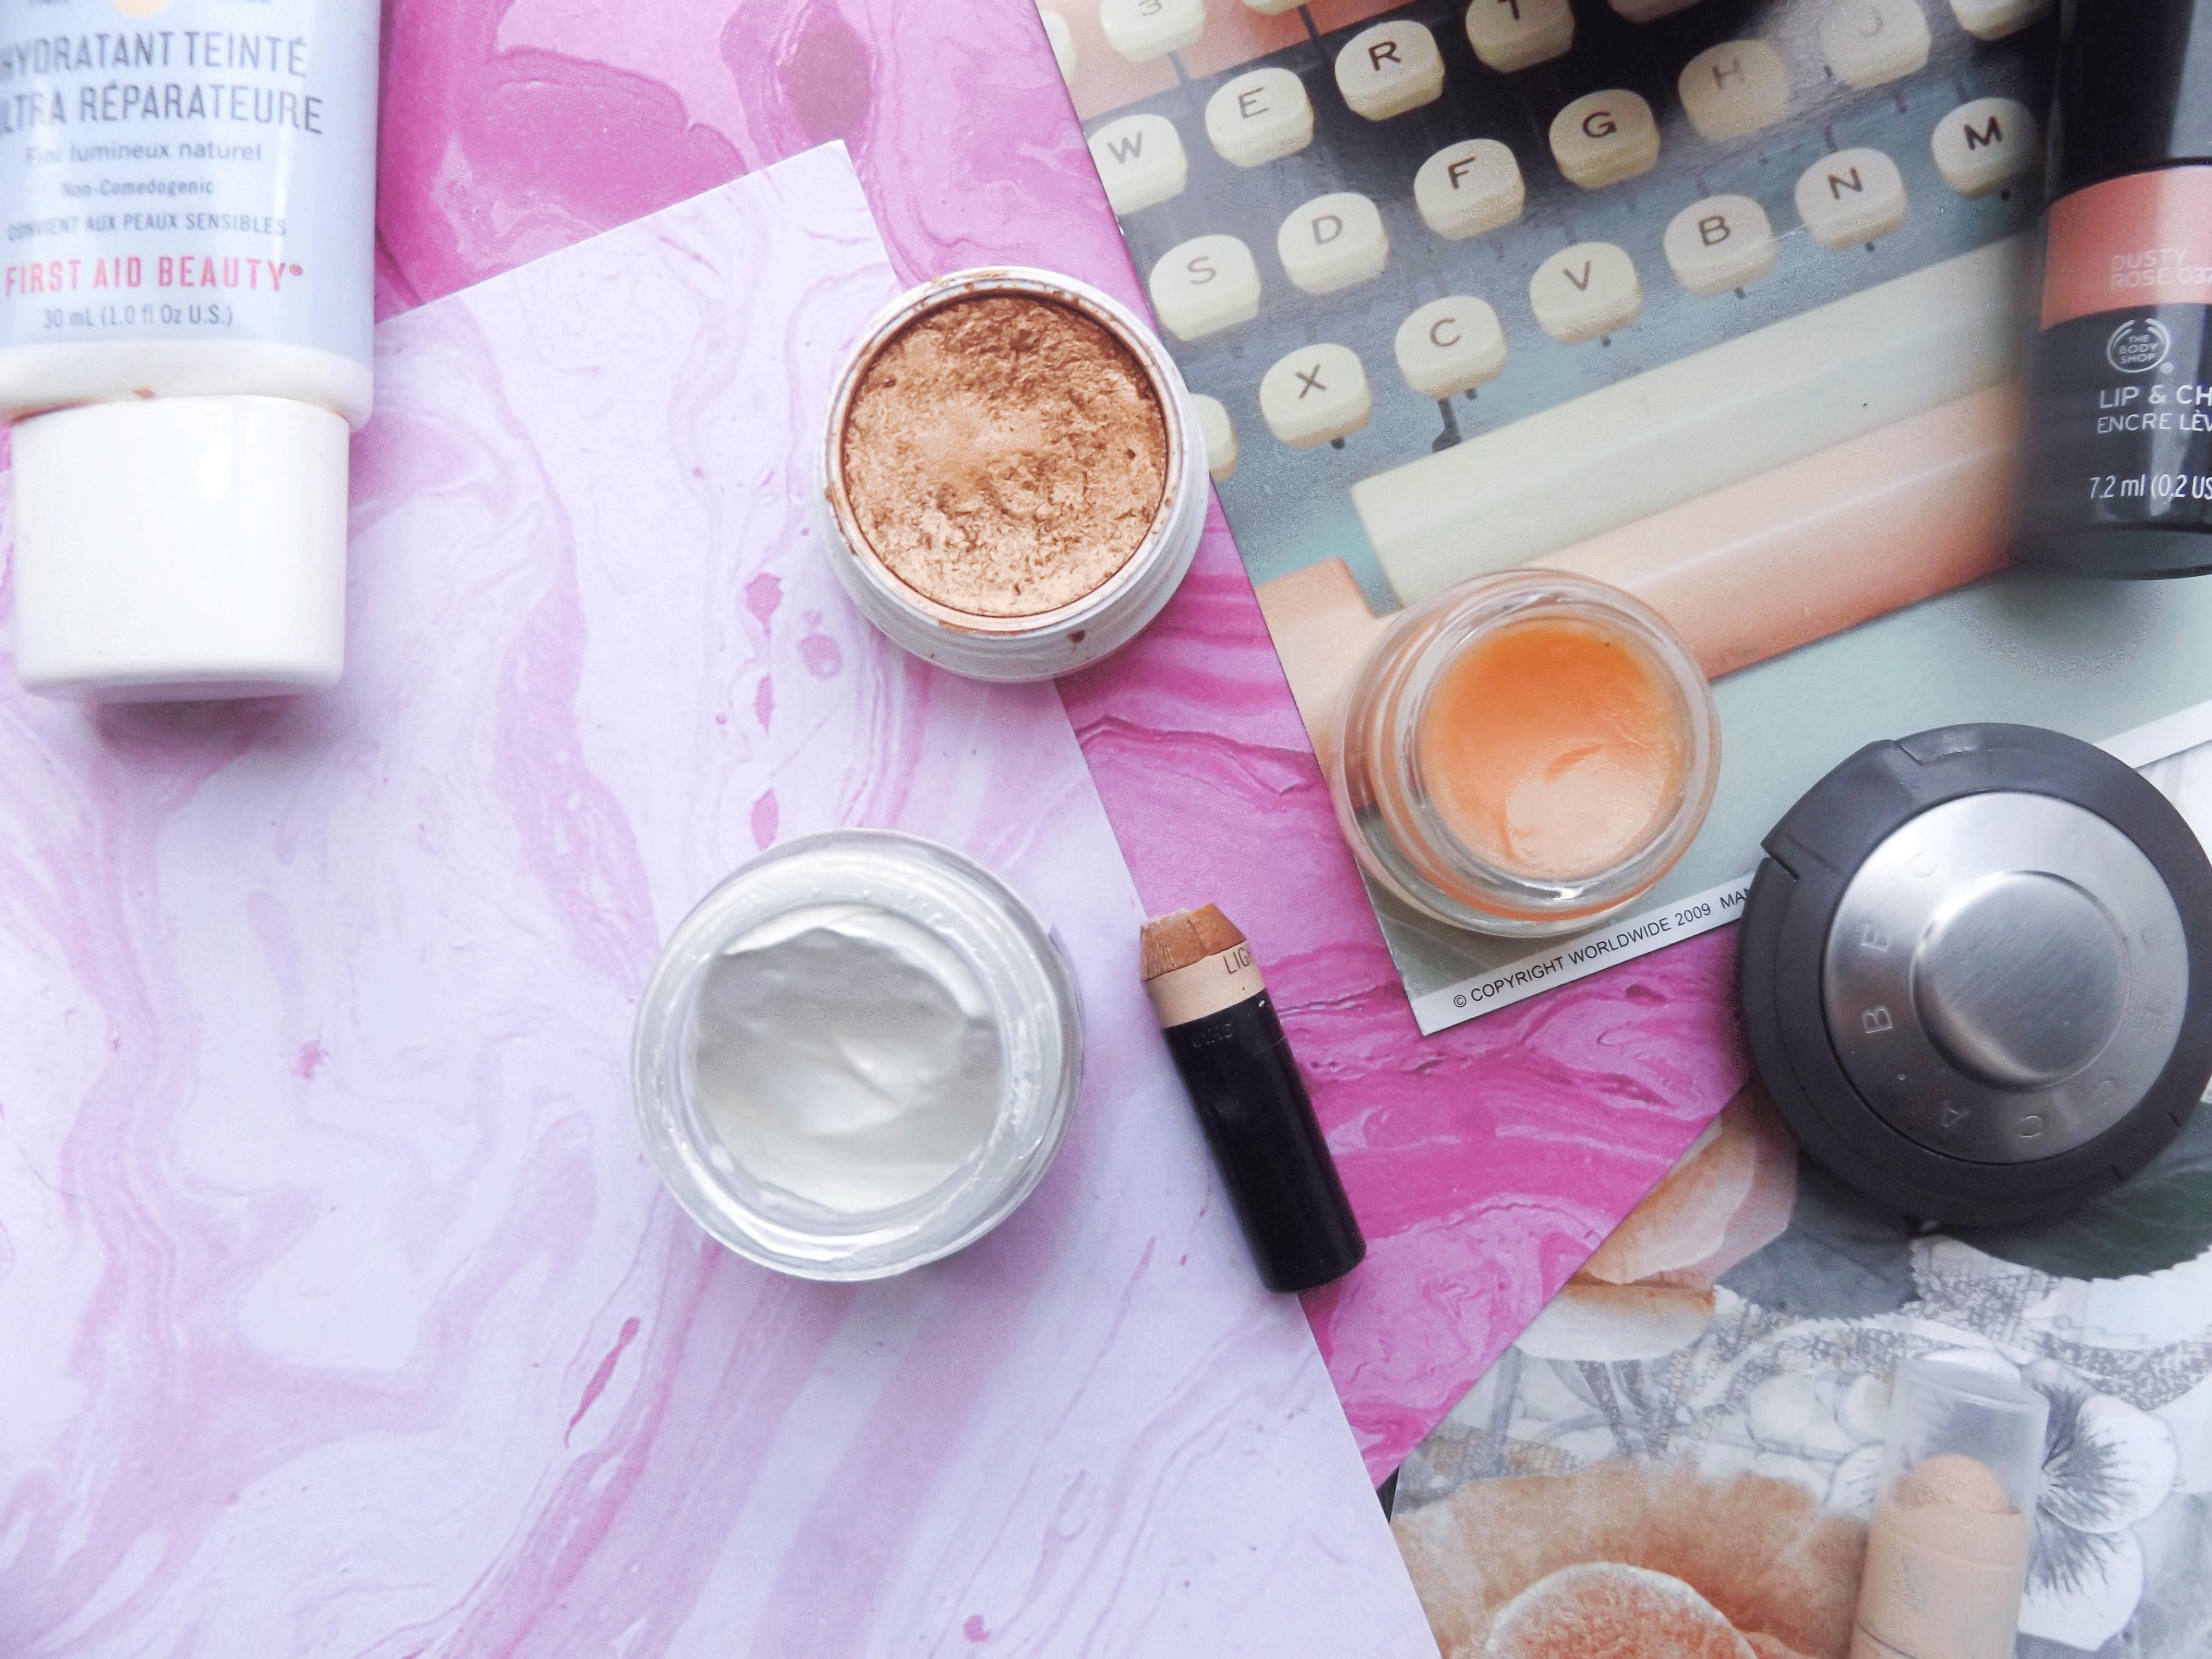 FAB-tinted-moisturizer